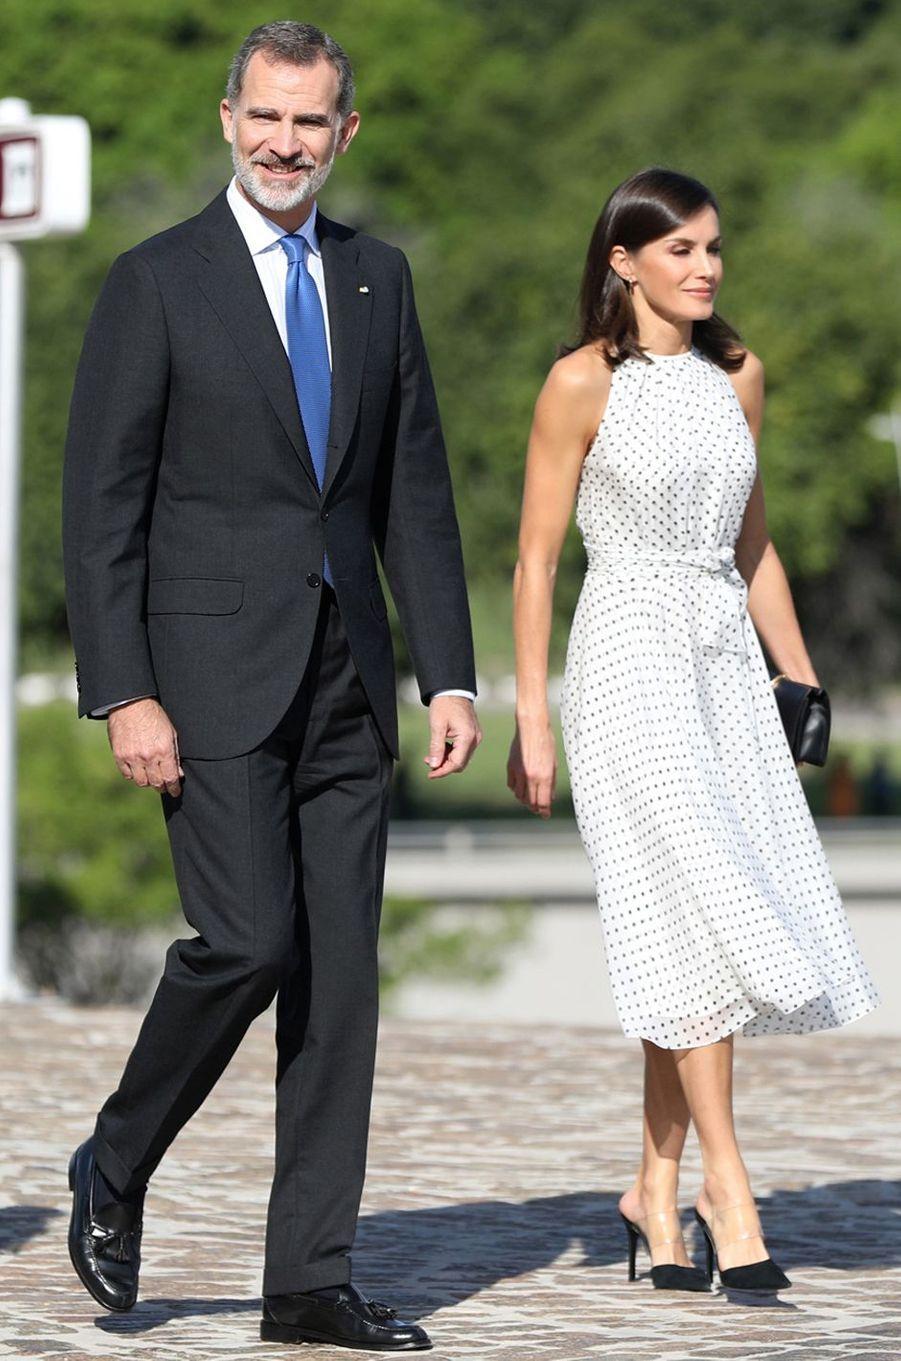 La reine Letizia d'Espagne dans une robe Carolina Herrera, avec le roi Felipe VI, à La Havane le 12 novembre 2019